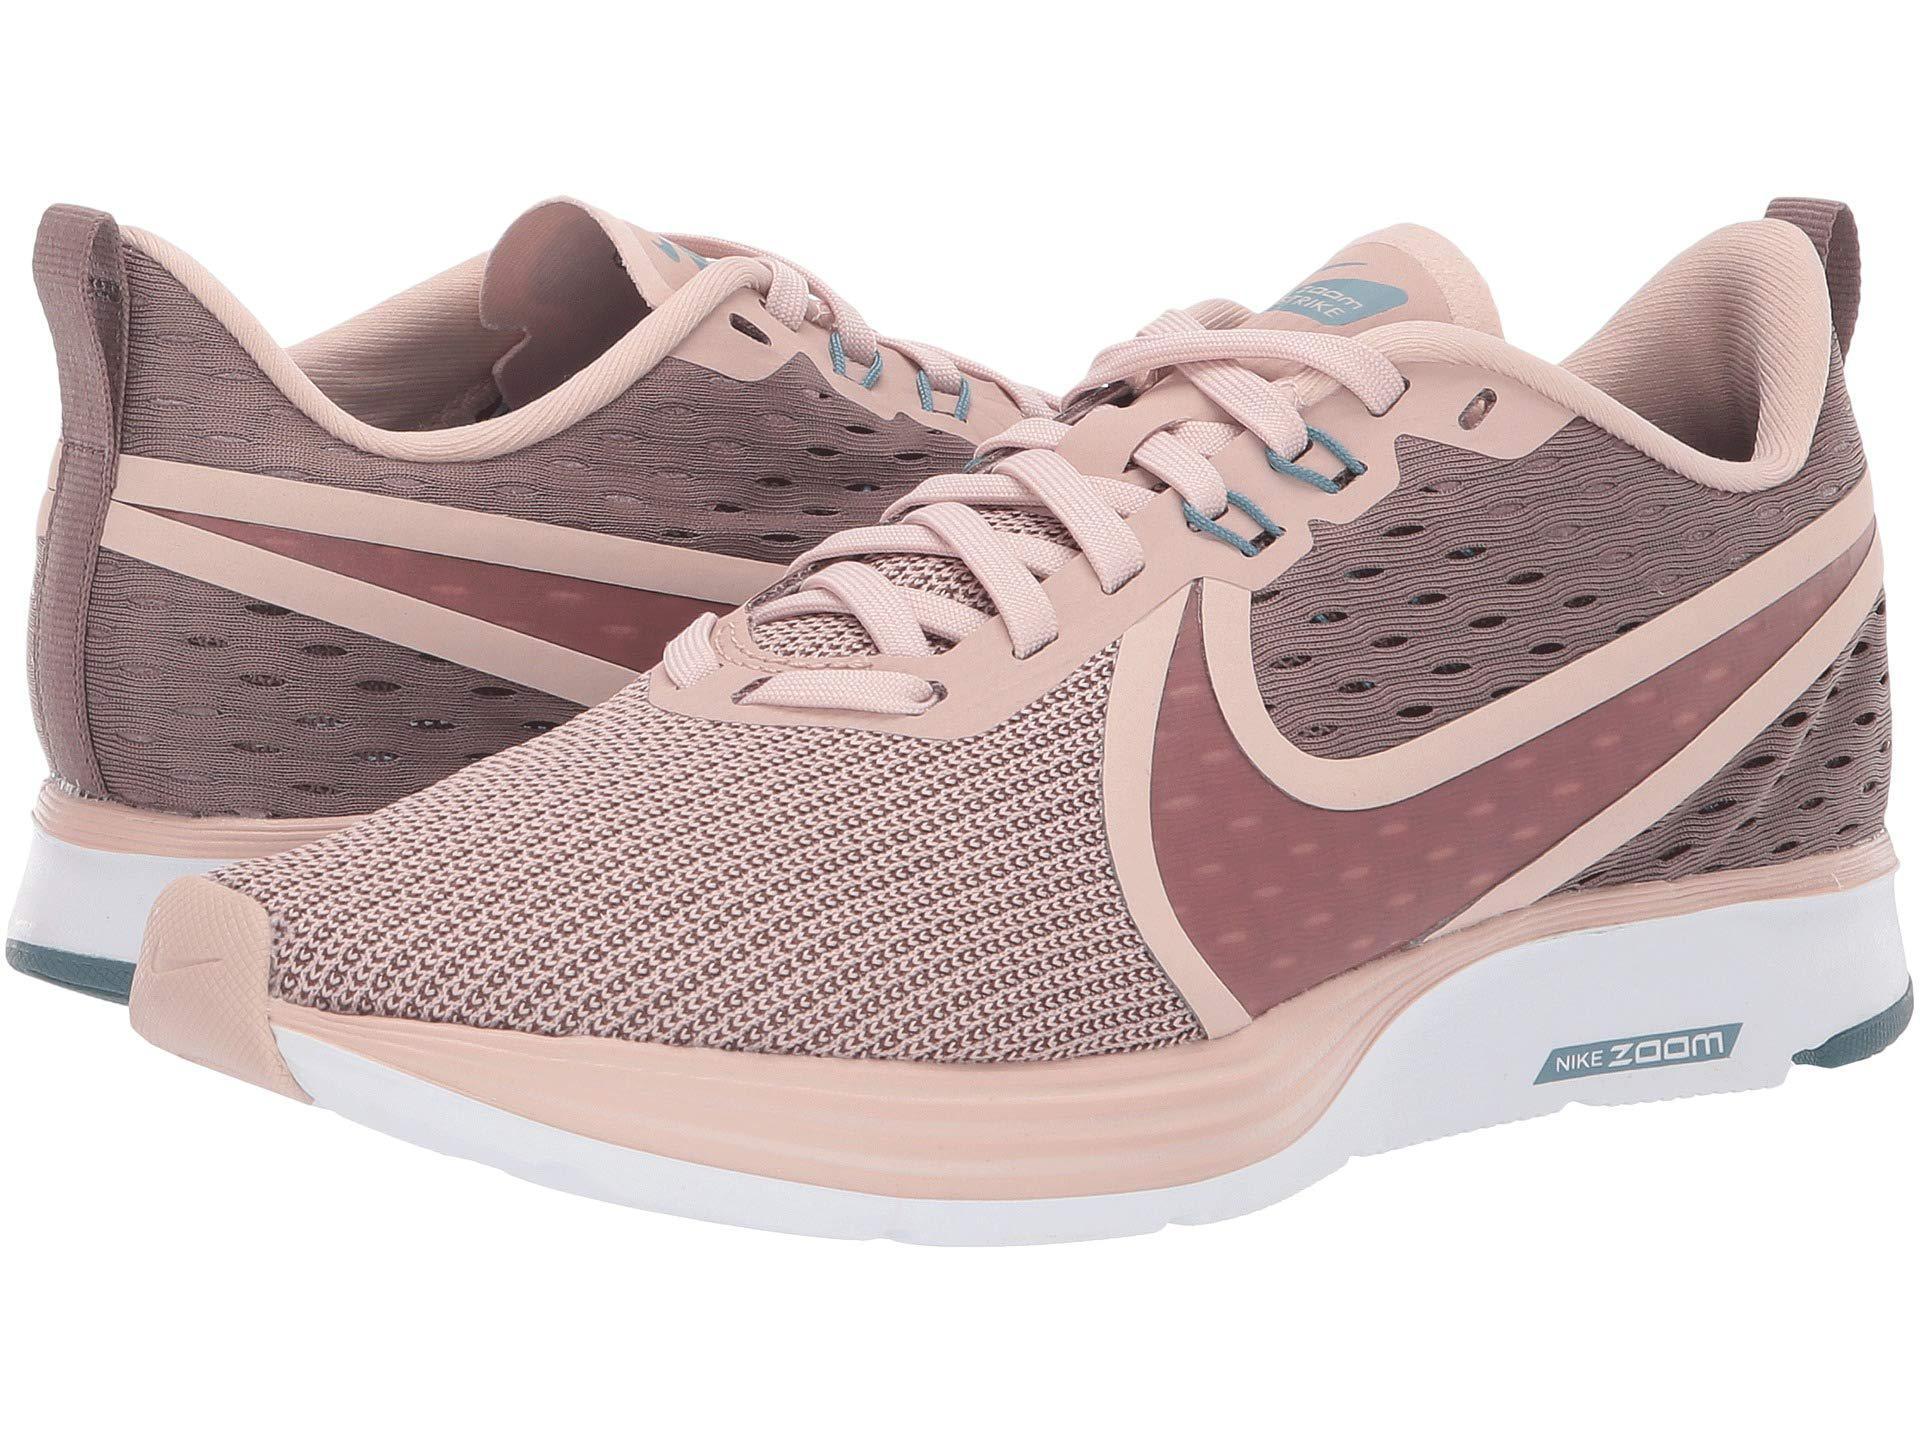 5840872632d6 Nike. Zoom Strike 2 (string metallic Gold phantom) Women s Running Shoes